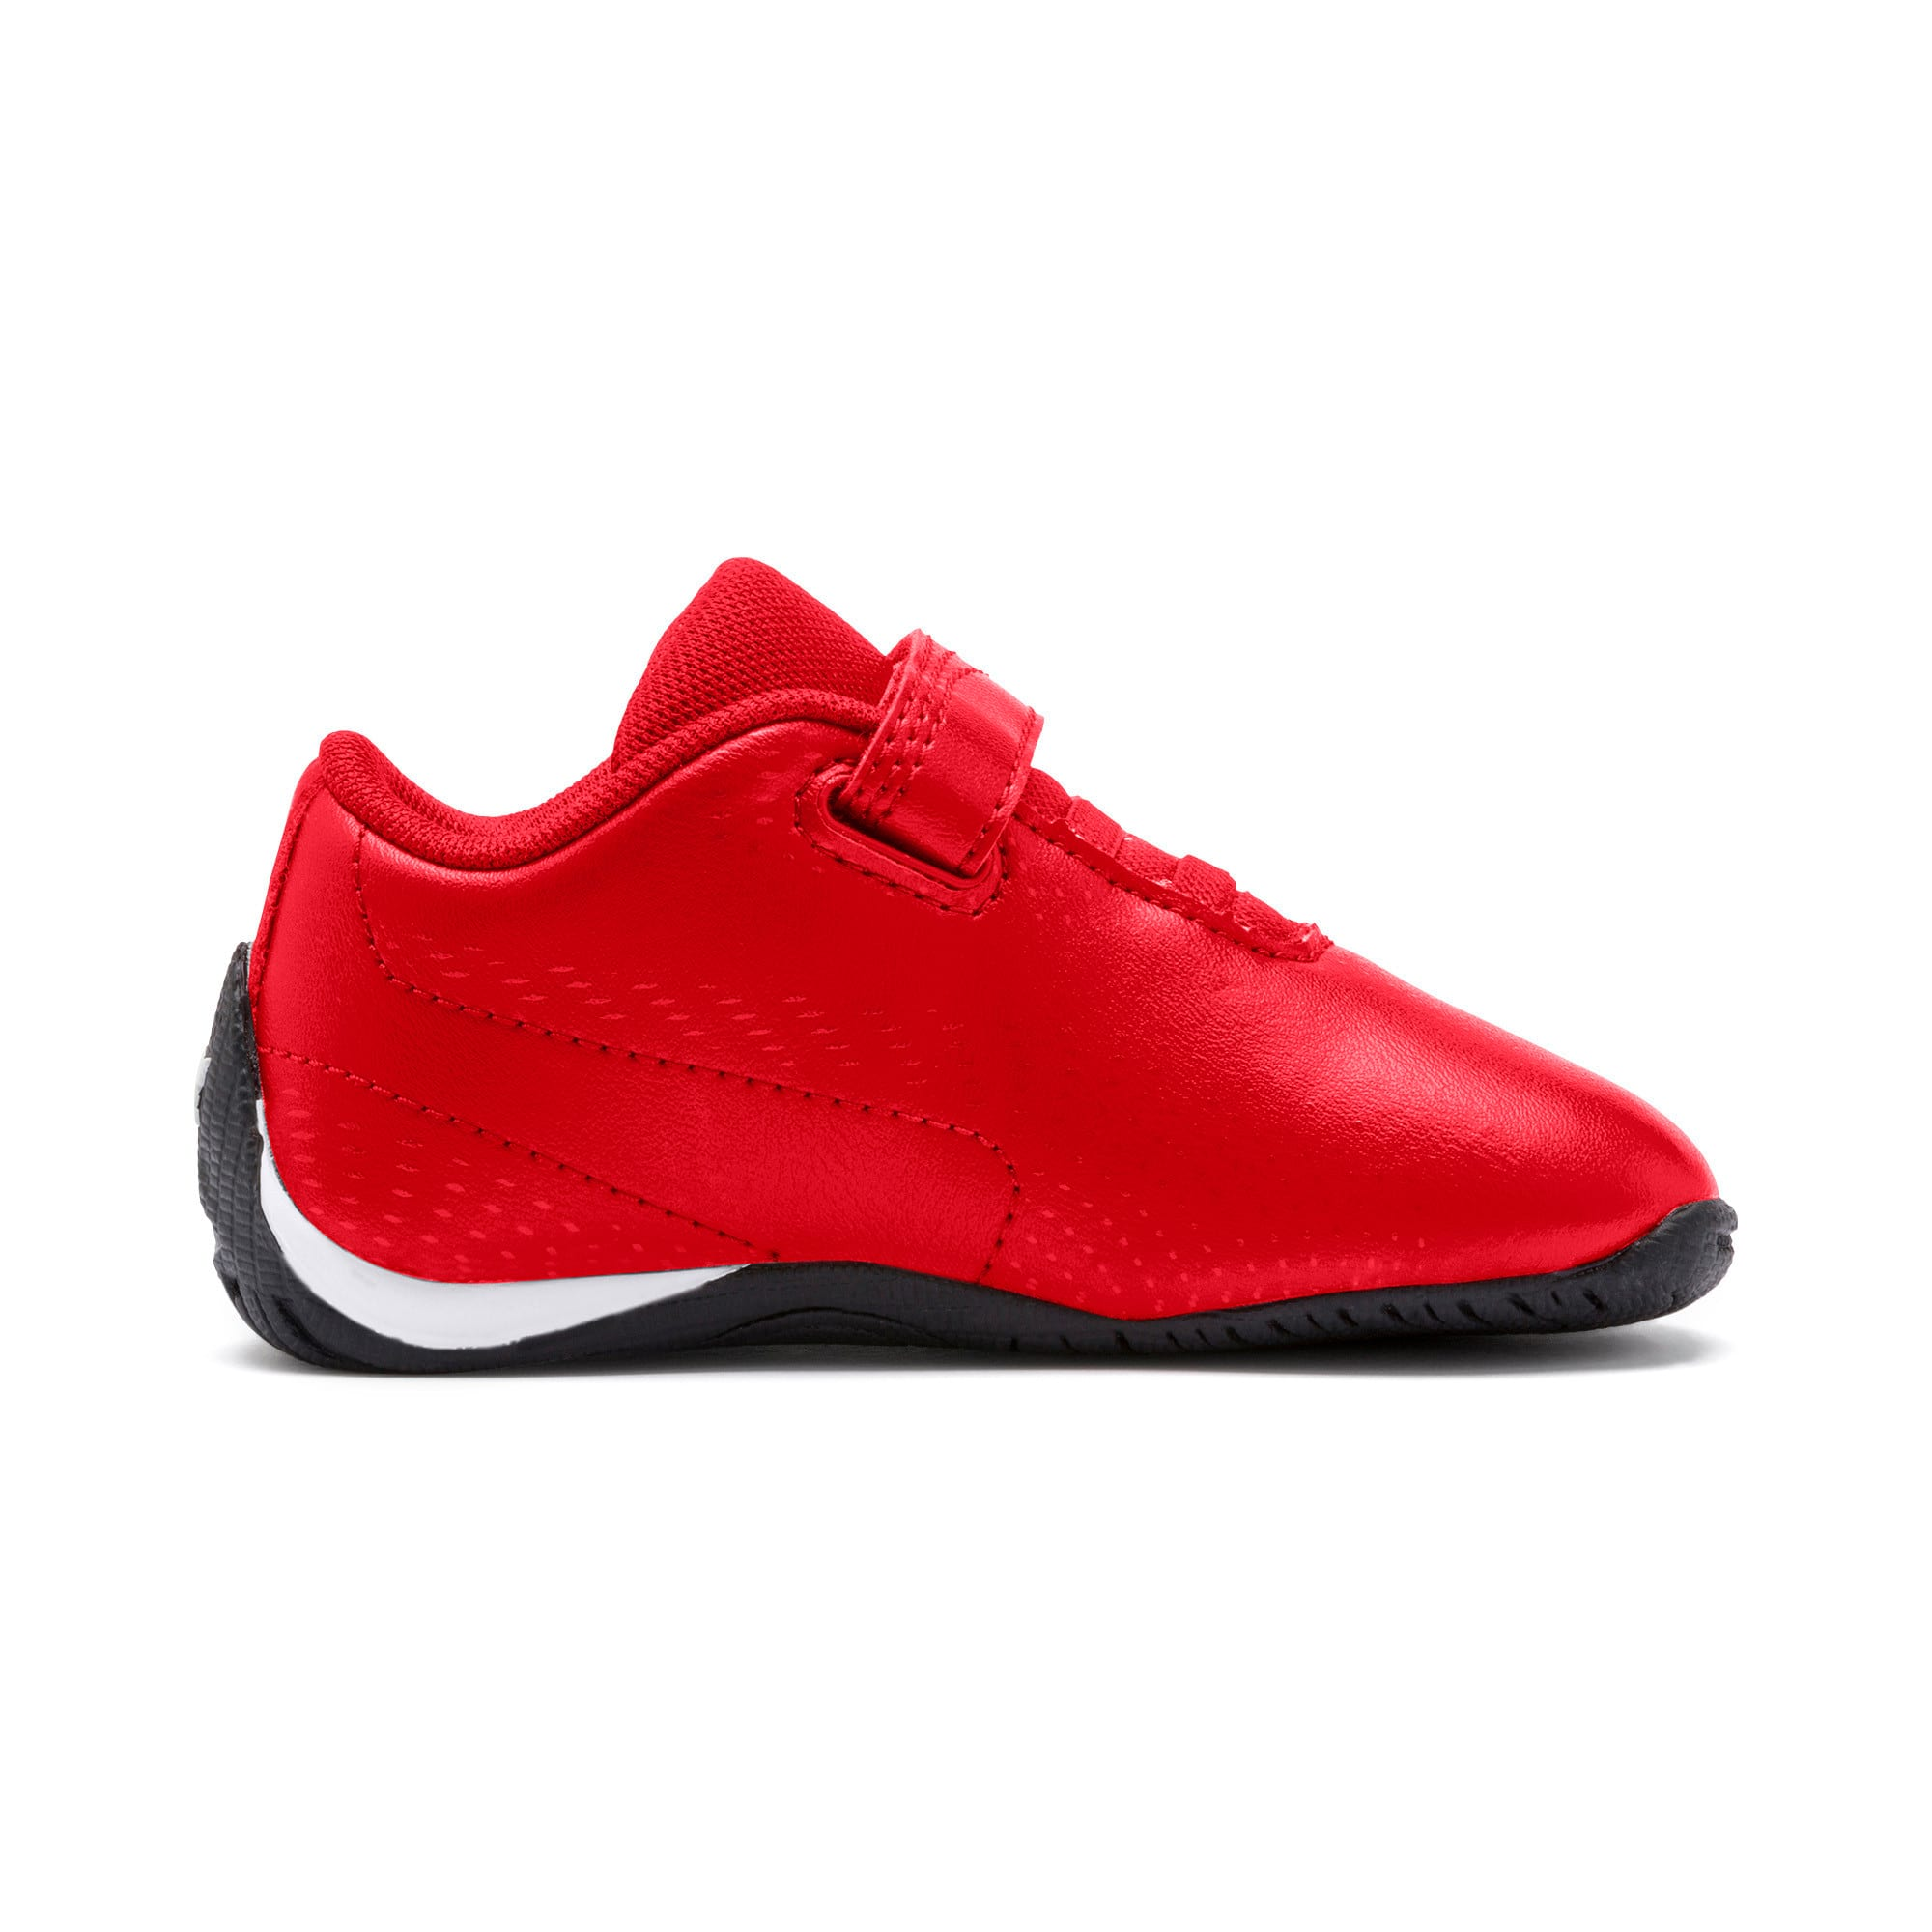 Thumbnail 5 of Scuderia Ferrari Drift Cat 5 Ultra II Toddler Shoes, Rosso Corsa-Puma White, medium